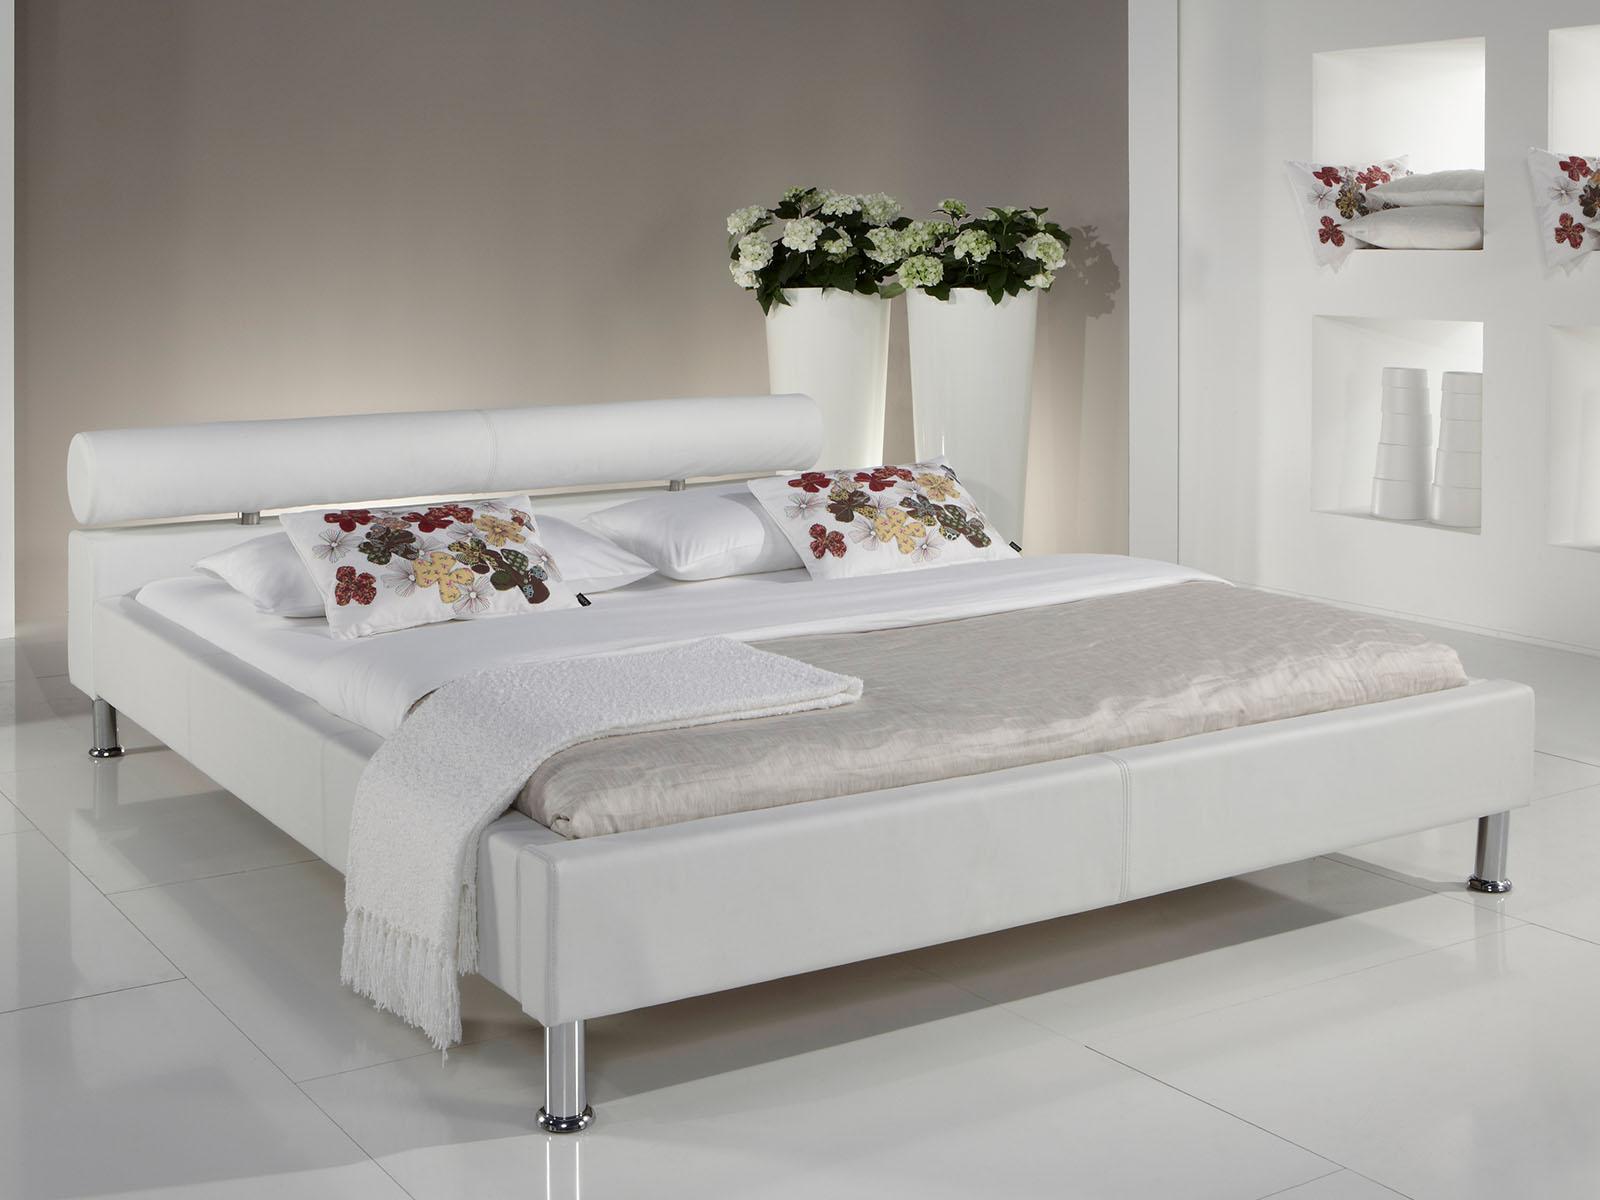 polsterbett einzelbett jugendbett doppelbett bett arno i wei 100x200 cm ebay. Black Bedroom Furniture Sets. Home Design Ideas